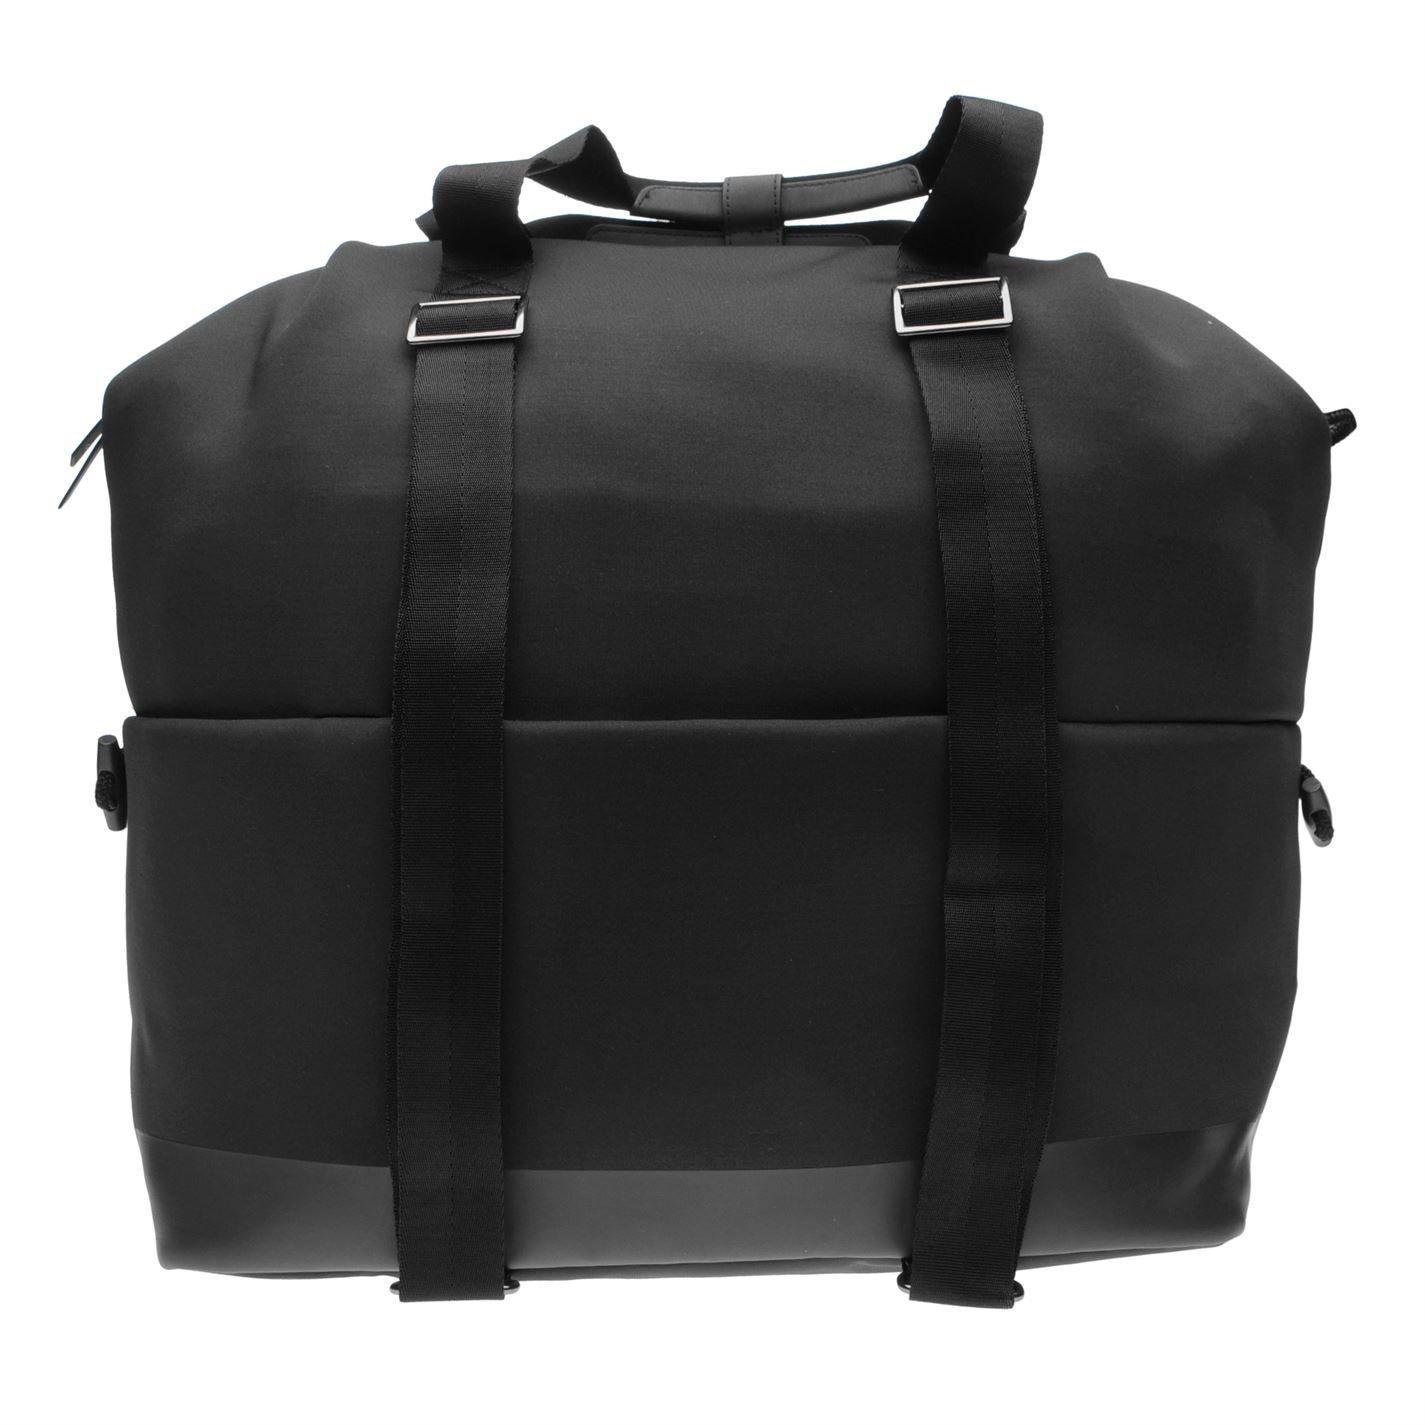 02d0d00a7e25 Adidas Favourite Convertible Tote Bag Womens Black Grey Shopper Bag  Carryall  Amazon.co.uk  Luggage